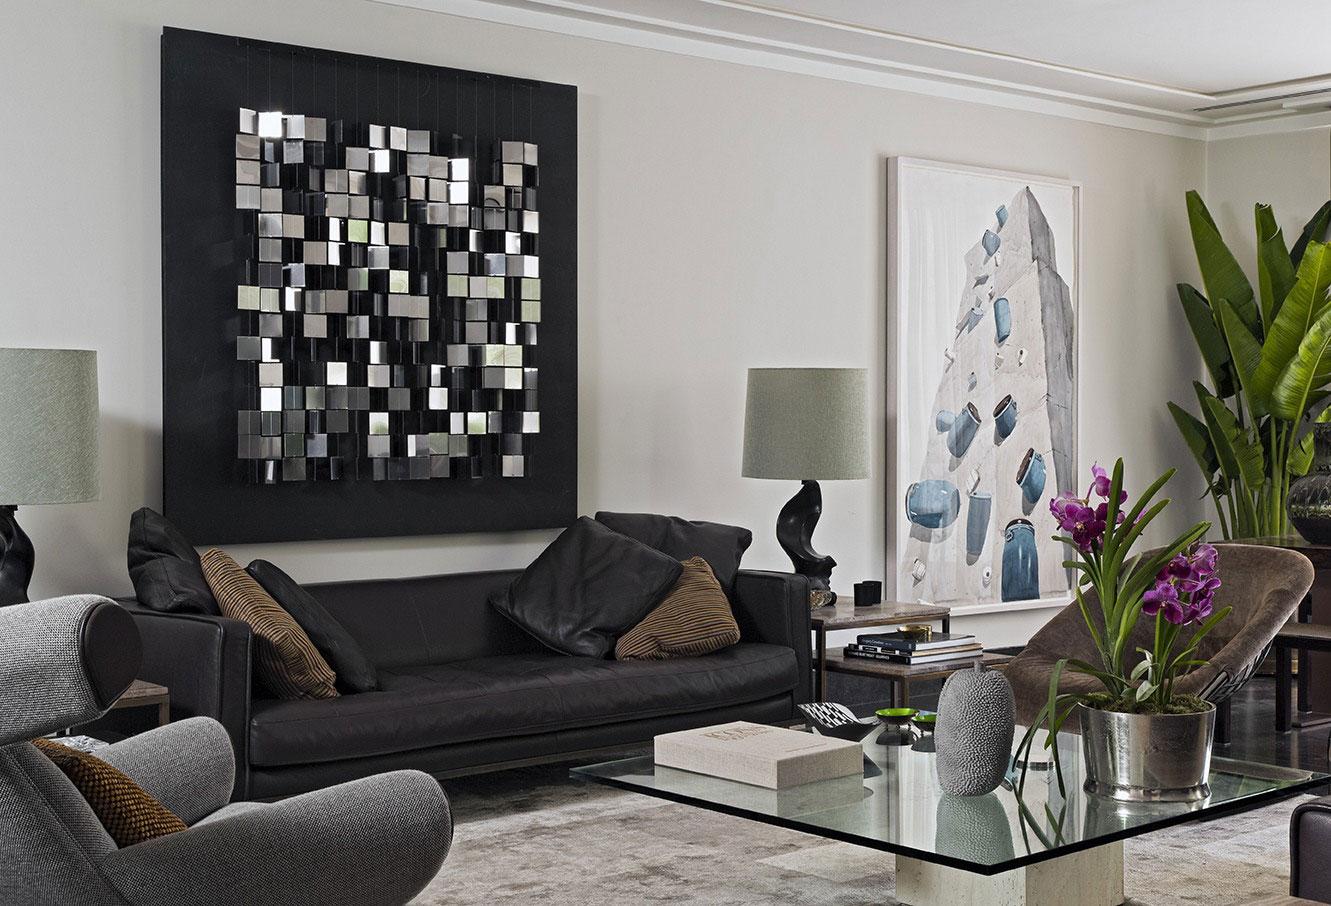 modern wall decor ideas mozaic wall art decor for living room EDRTDHU